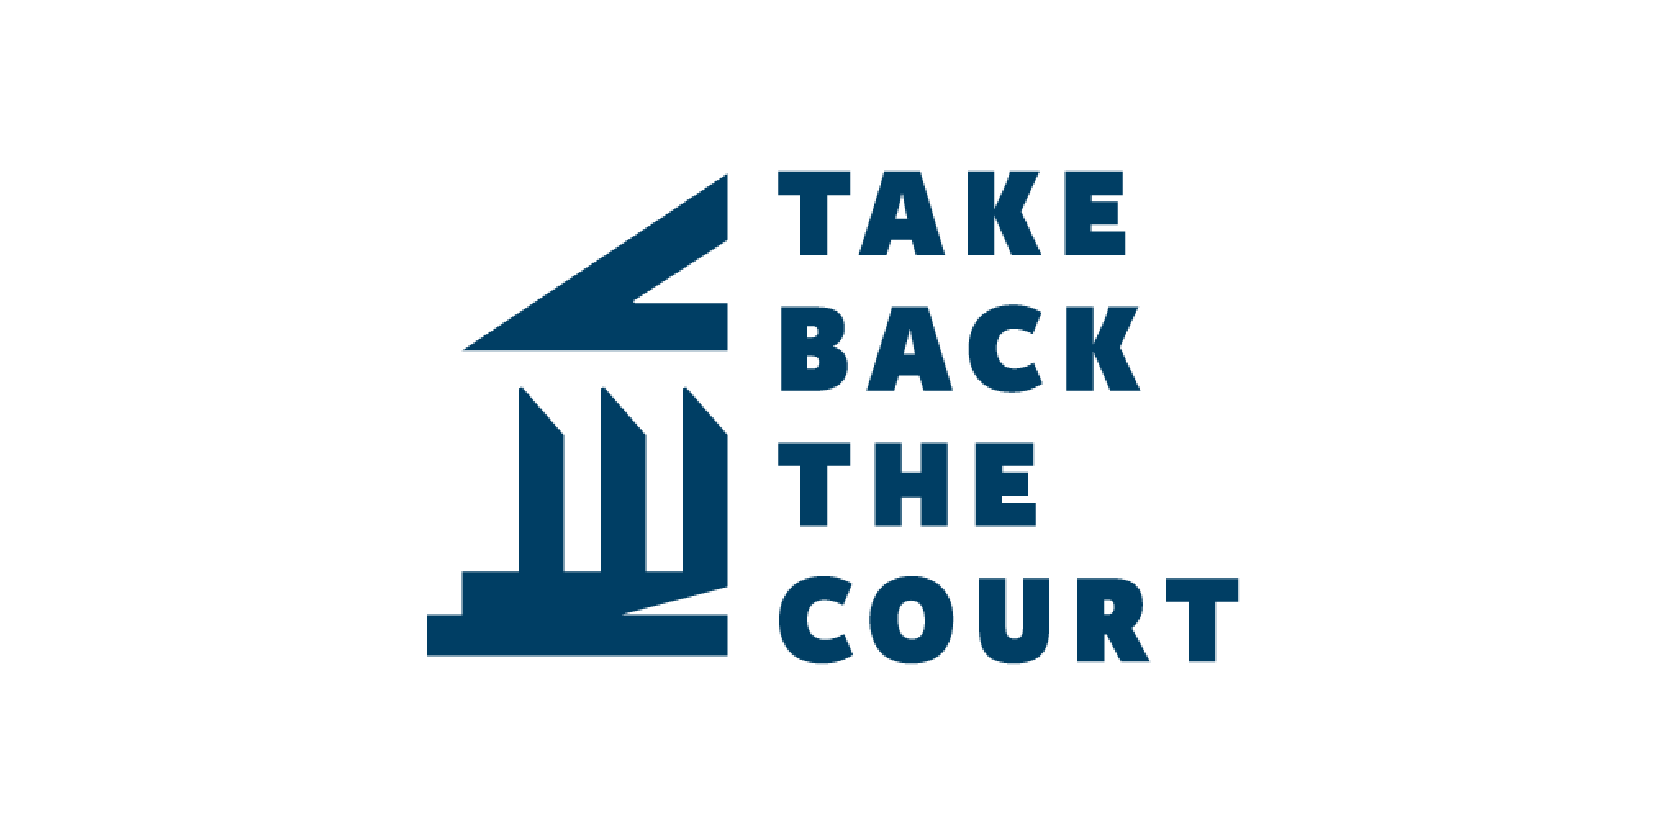 Take Back the Court logo